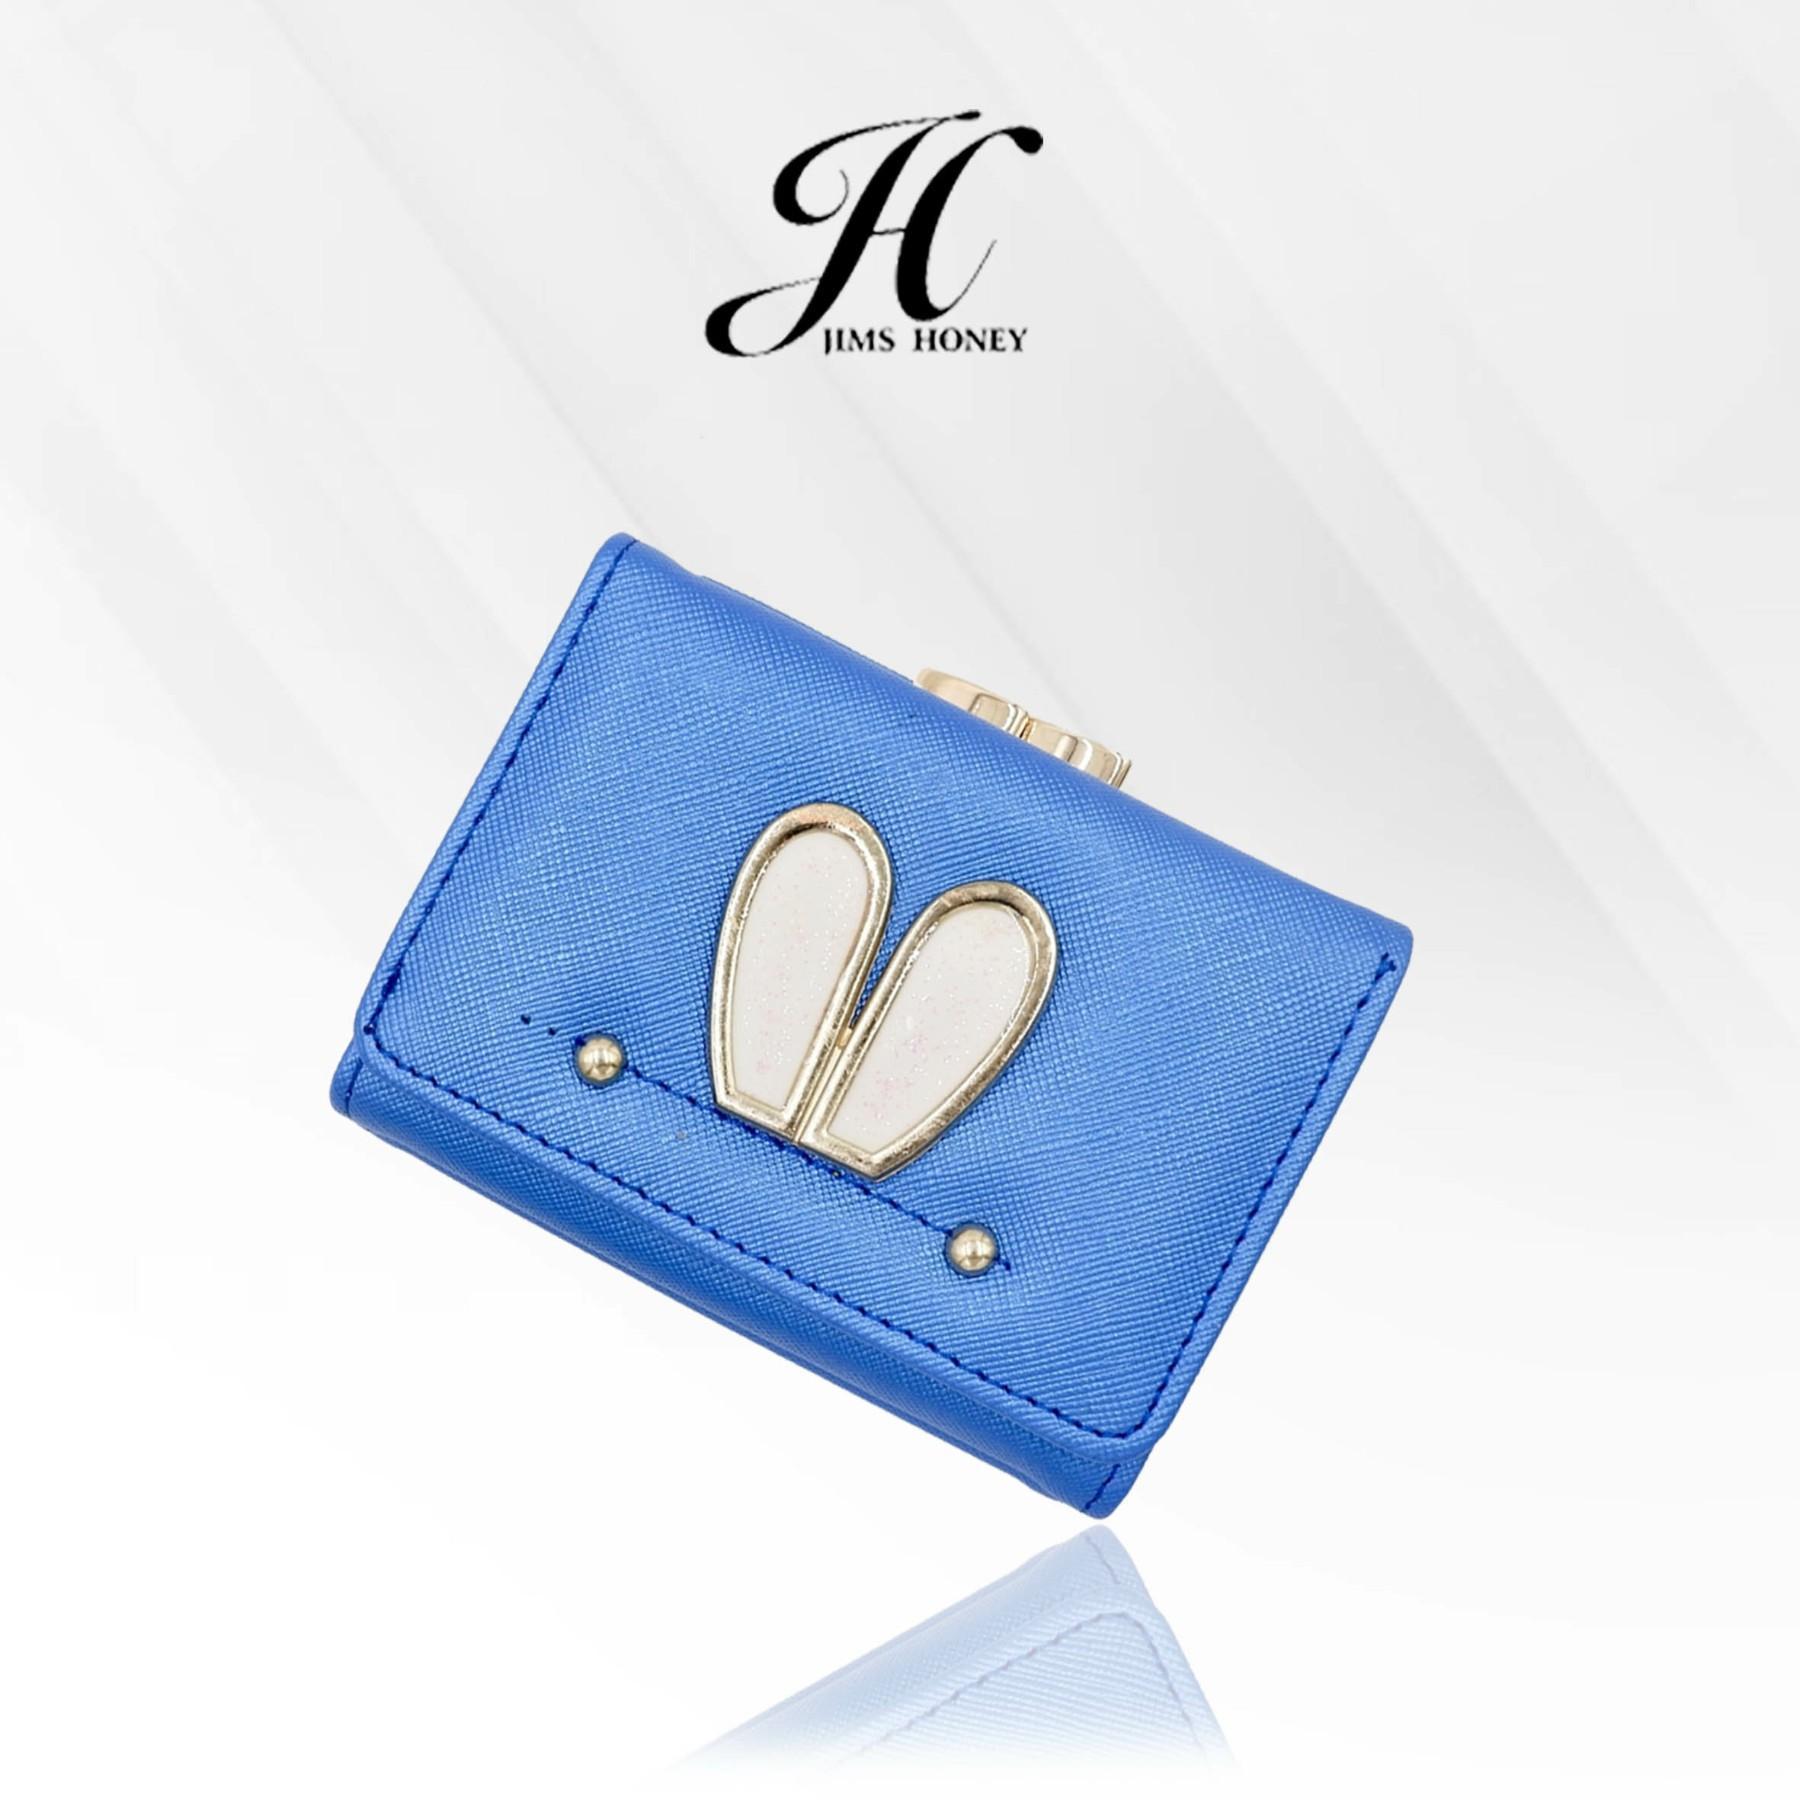 Dompet Kecil Wanita Allecia Wallet Jimshoney original dompet cantik wanita  import Tas Wanita Lazada Tas Wanita d1b8bf463a